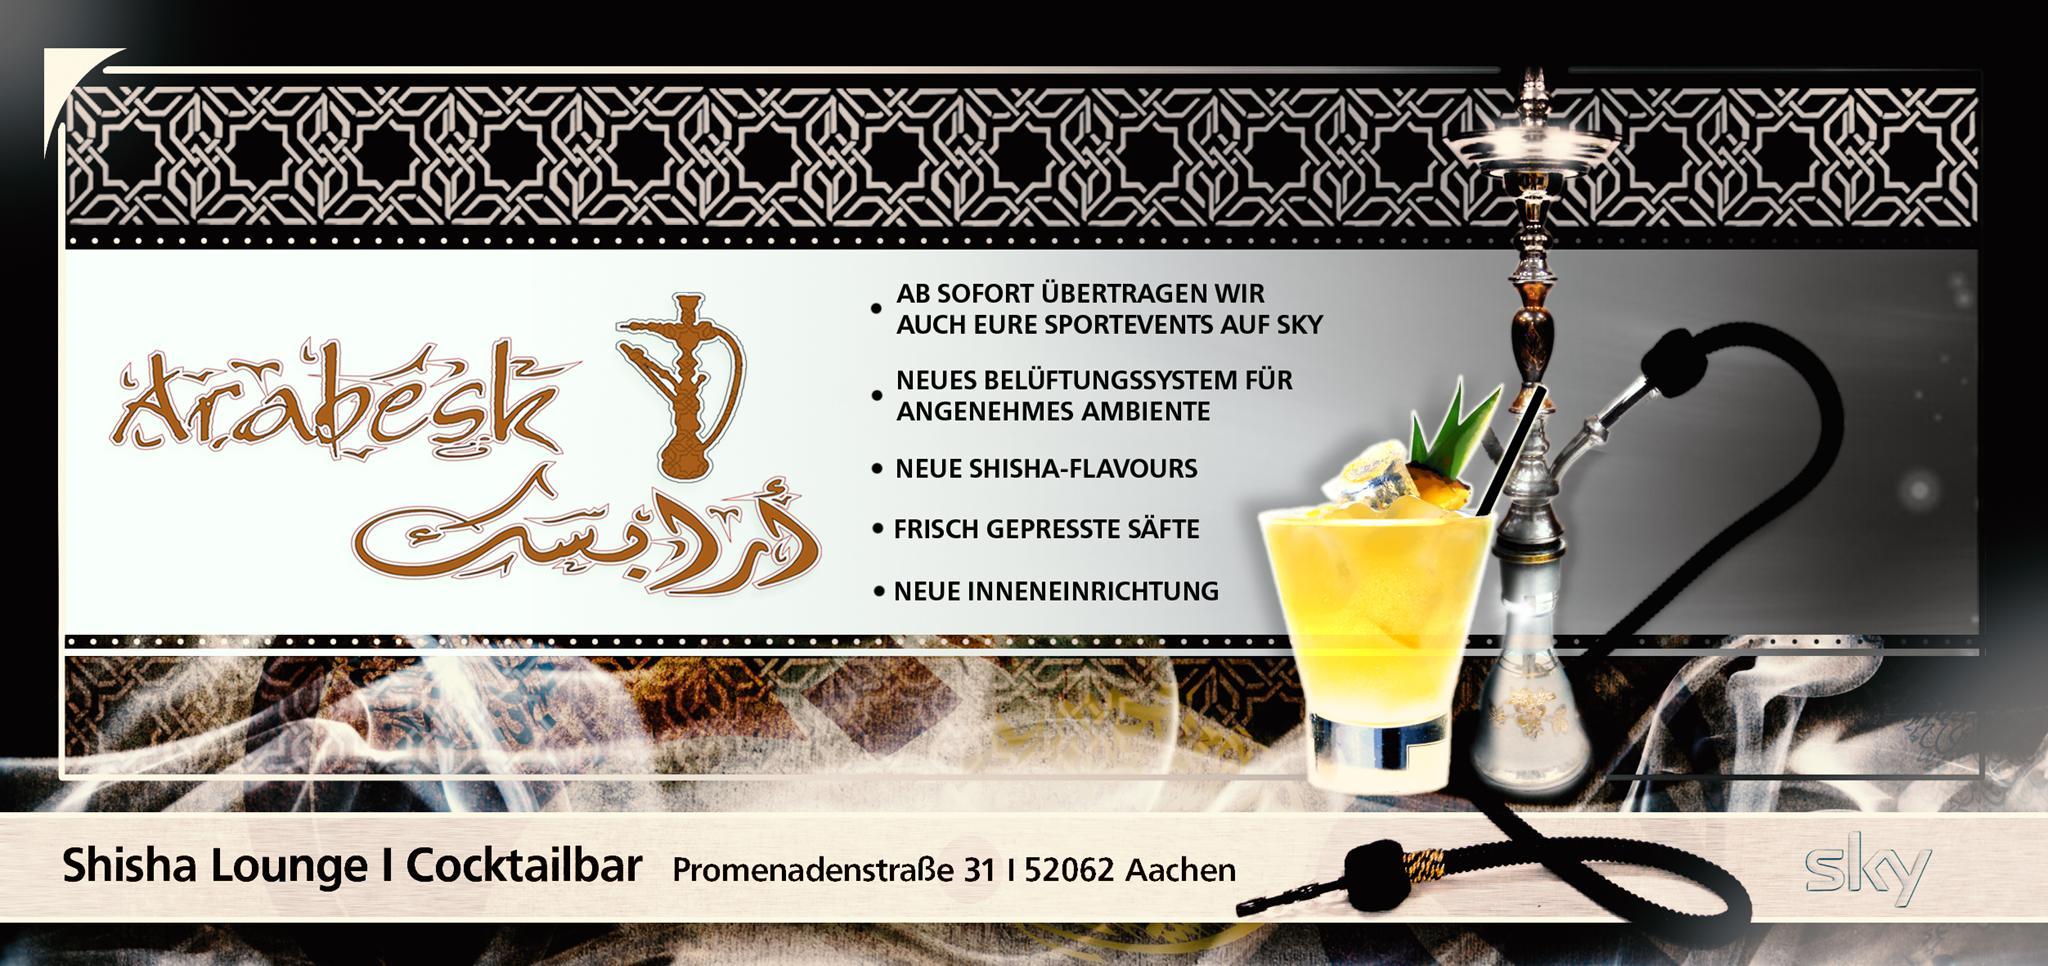 Willkommen! | Arabesk Shisha Lounge